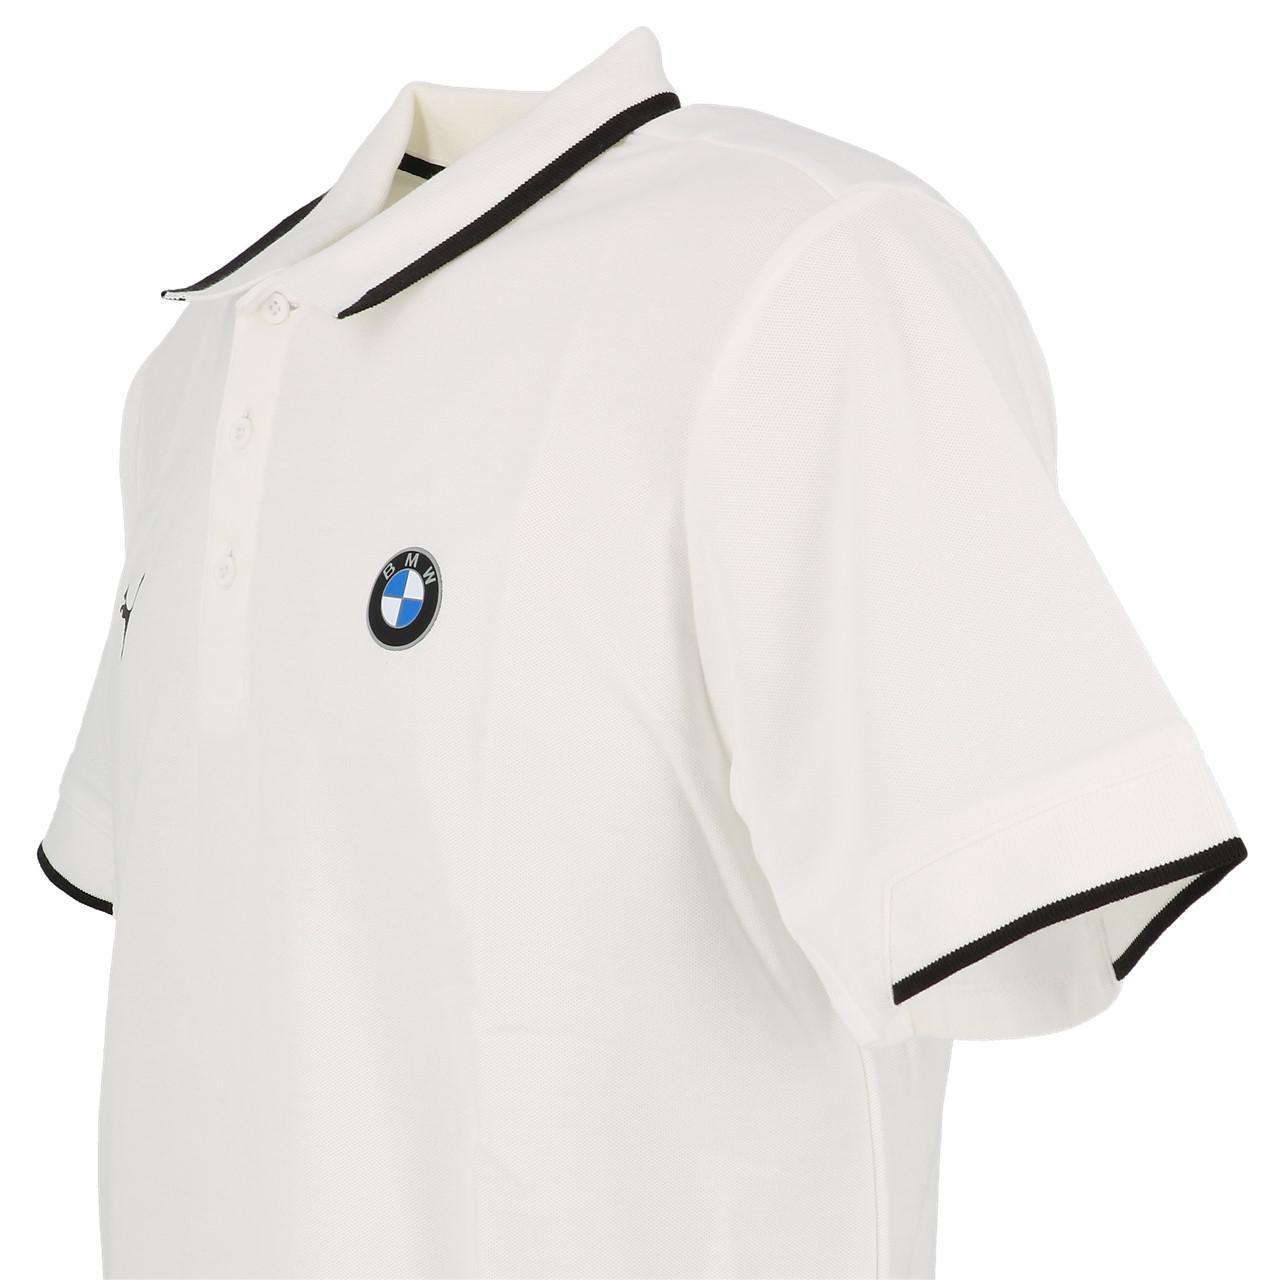 Short-Sleeve-Polo-Puma-BMW-Mms-Wht-Mc-Polo-White-30113-New thumbnail 3